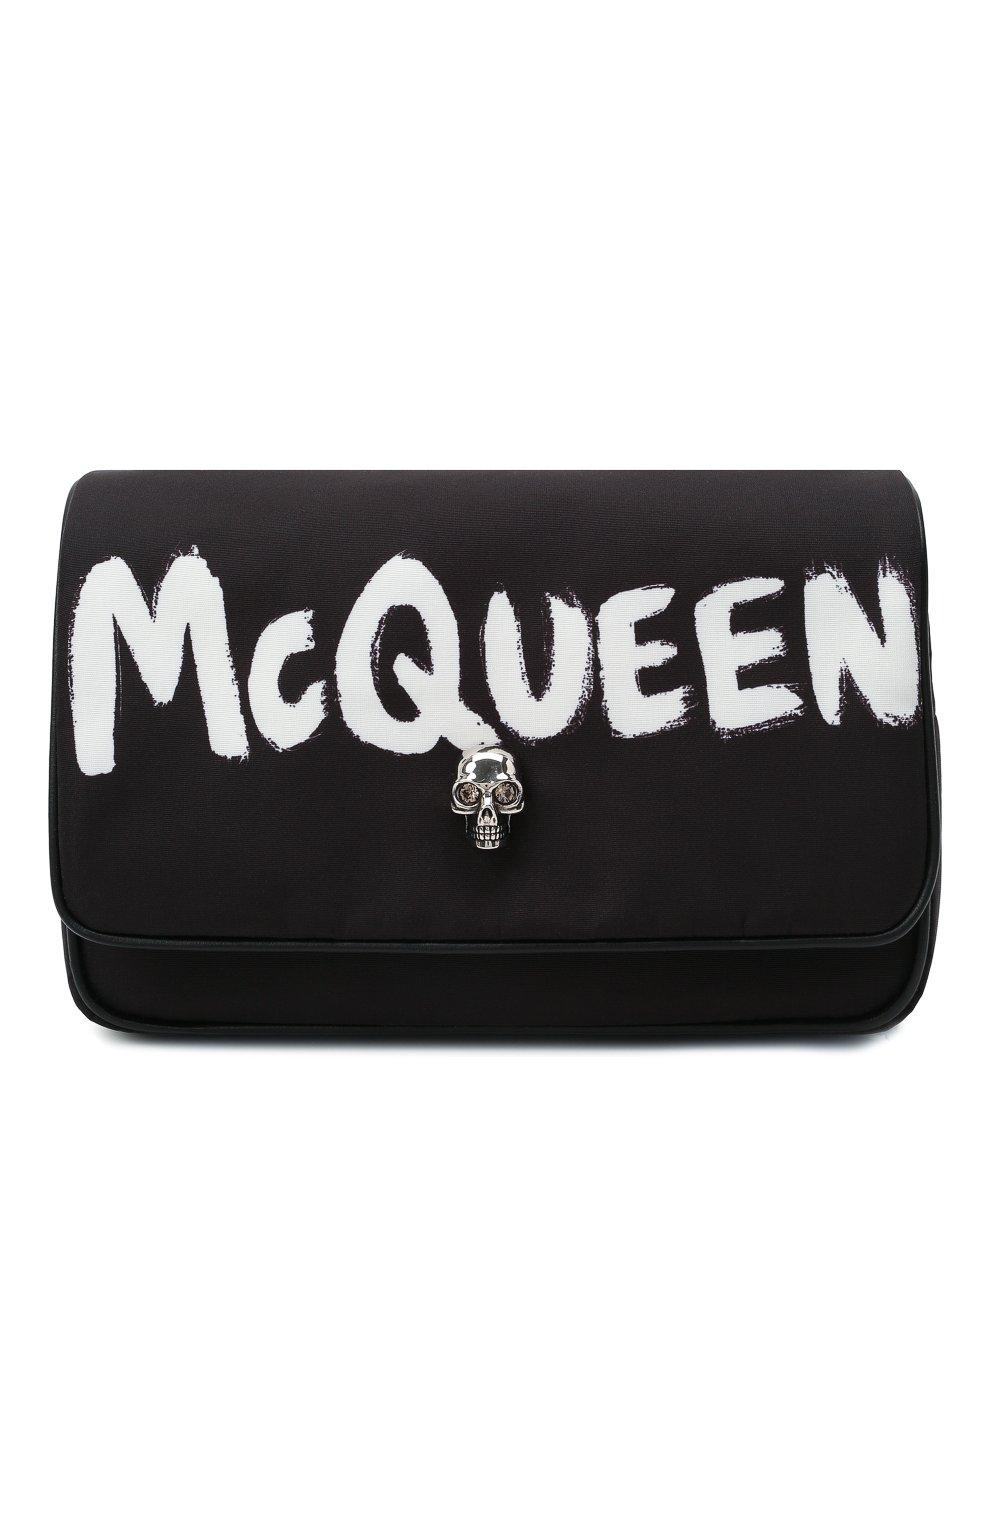 Женская сумка skull ALEXANDER MCQUEEN черного цвета, арт. 666120/16XAB | Фото 1 (Сумки-технические: Сумки через плечо; Размер: mini; Ремень/цепочка: На ремешке; Материал: Текстиль)